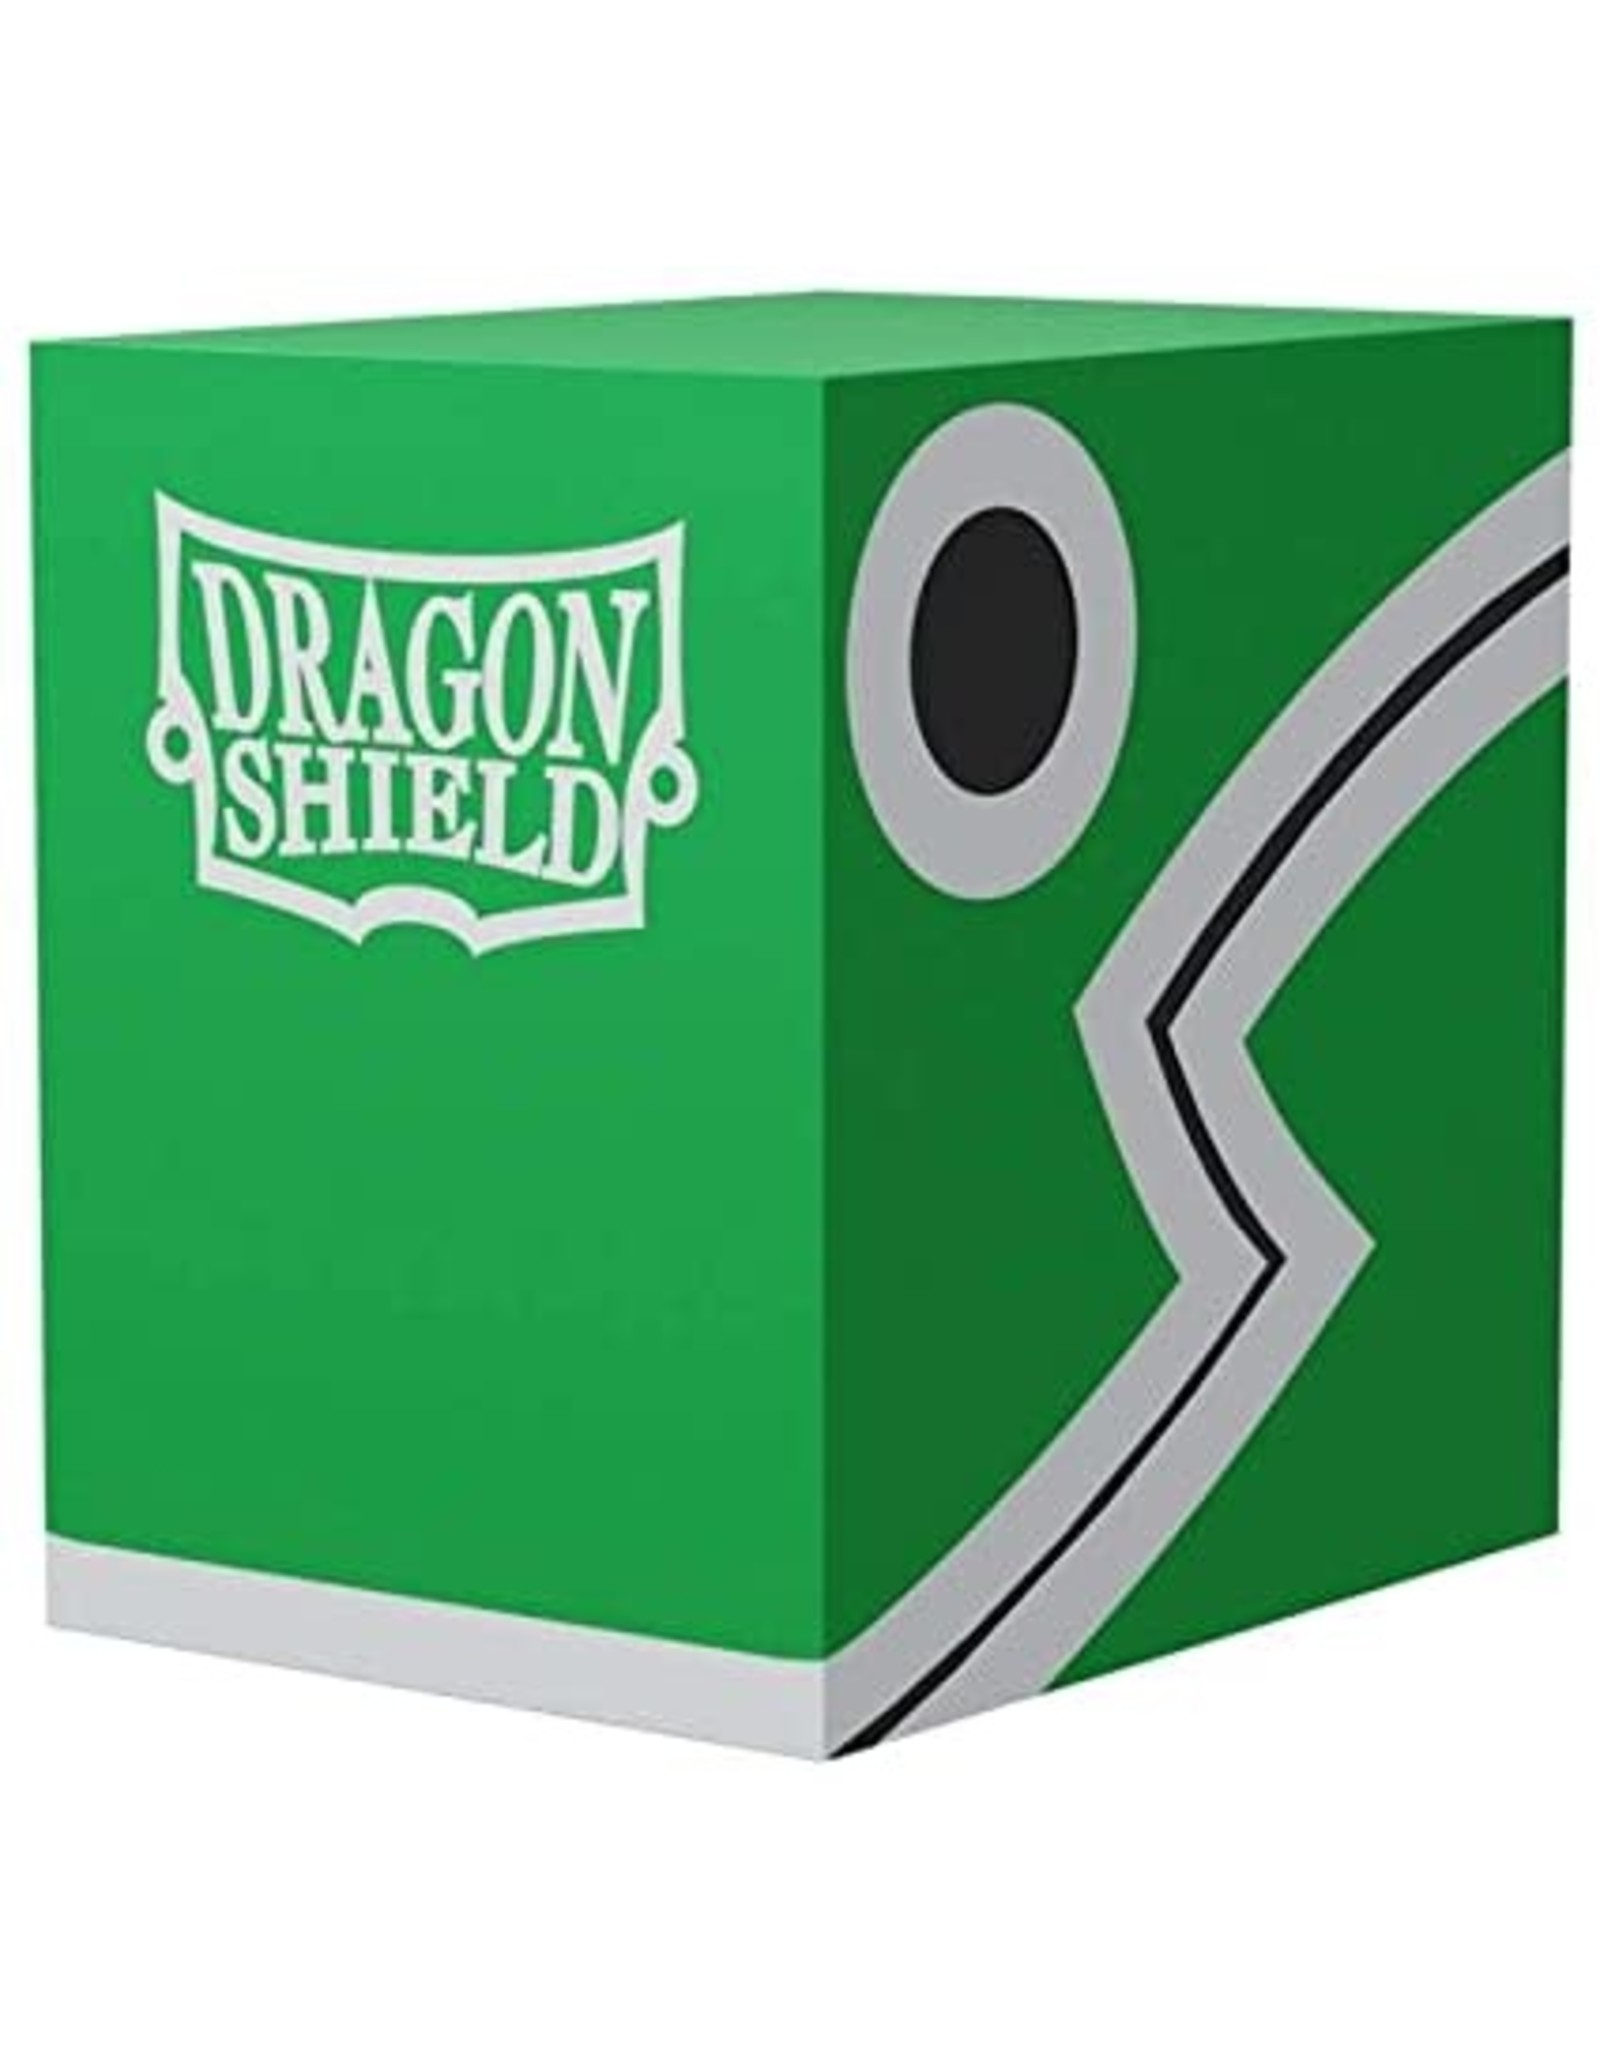 Dragon Shield Double Deck Shells (Green/Black )